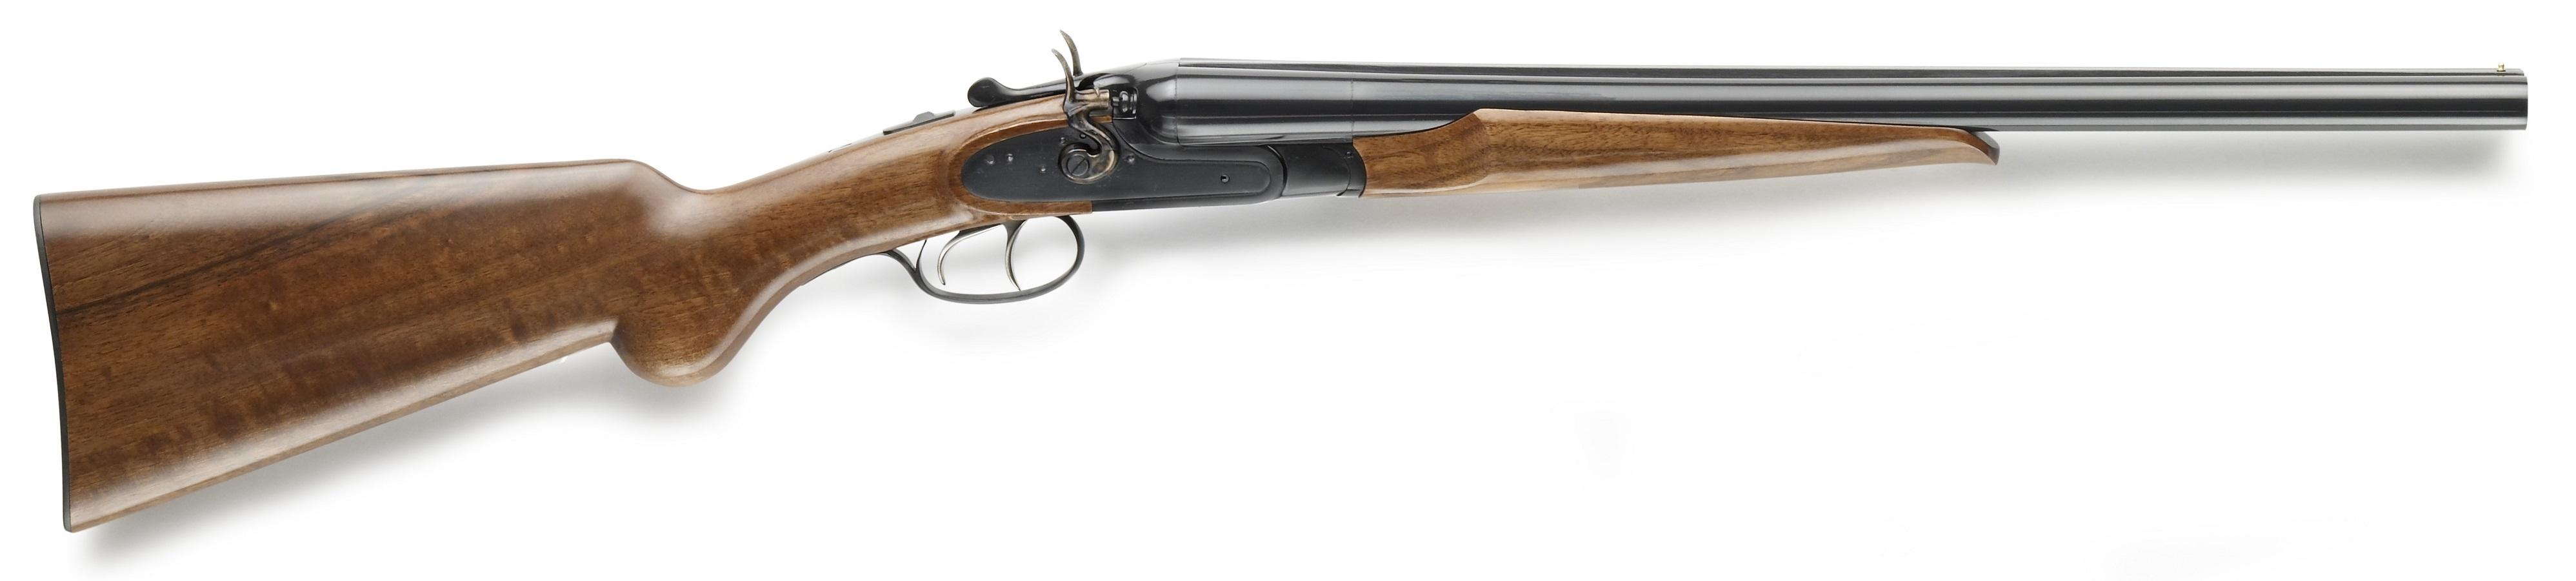 Coach Gun Pietta modèle 1878 en calibre 12/76